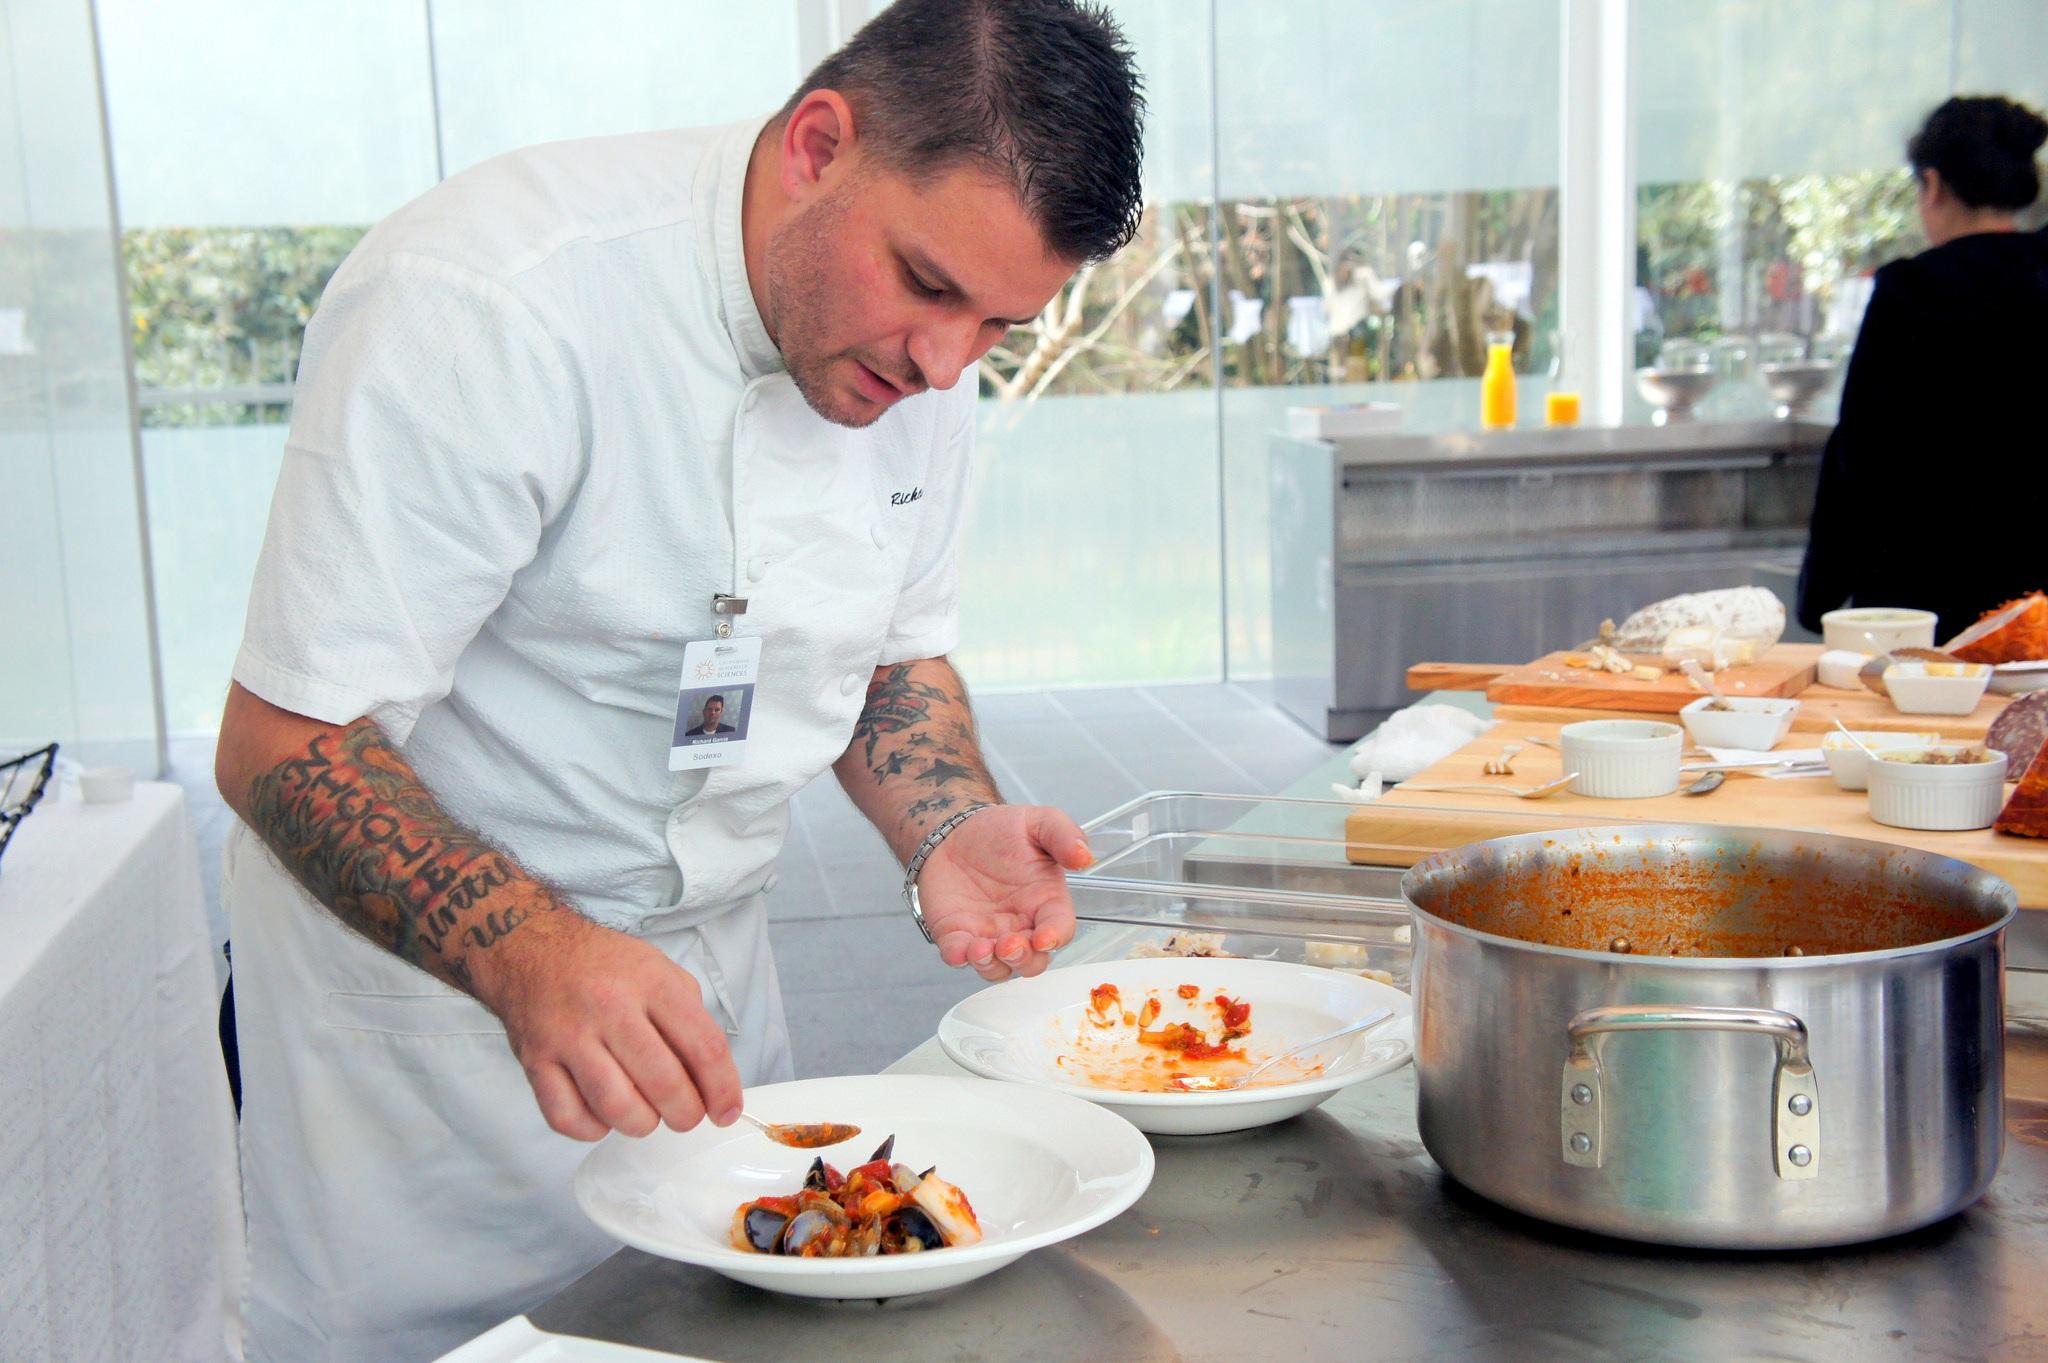 A sodexo chef at work